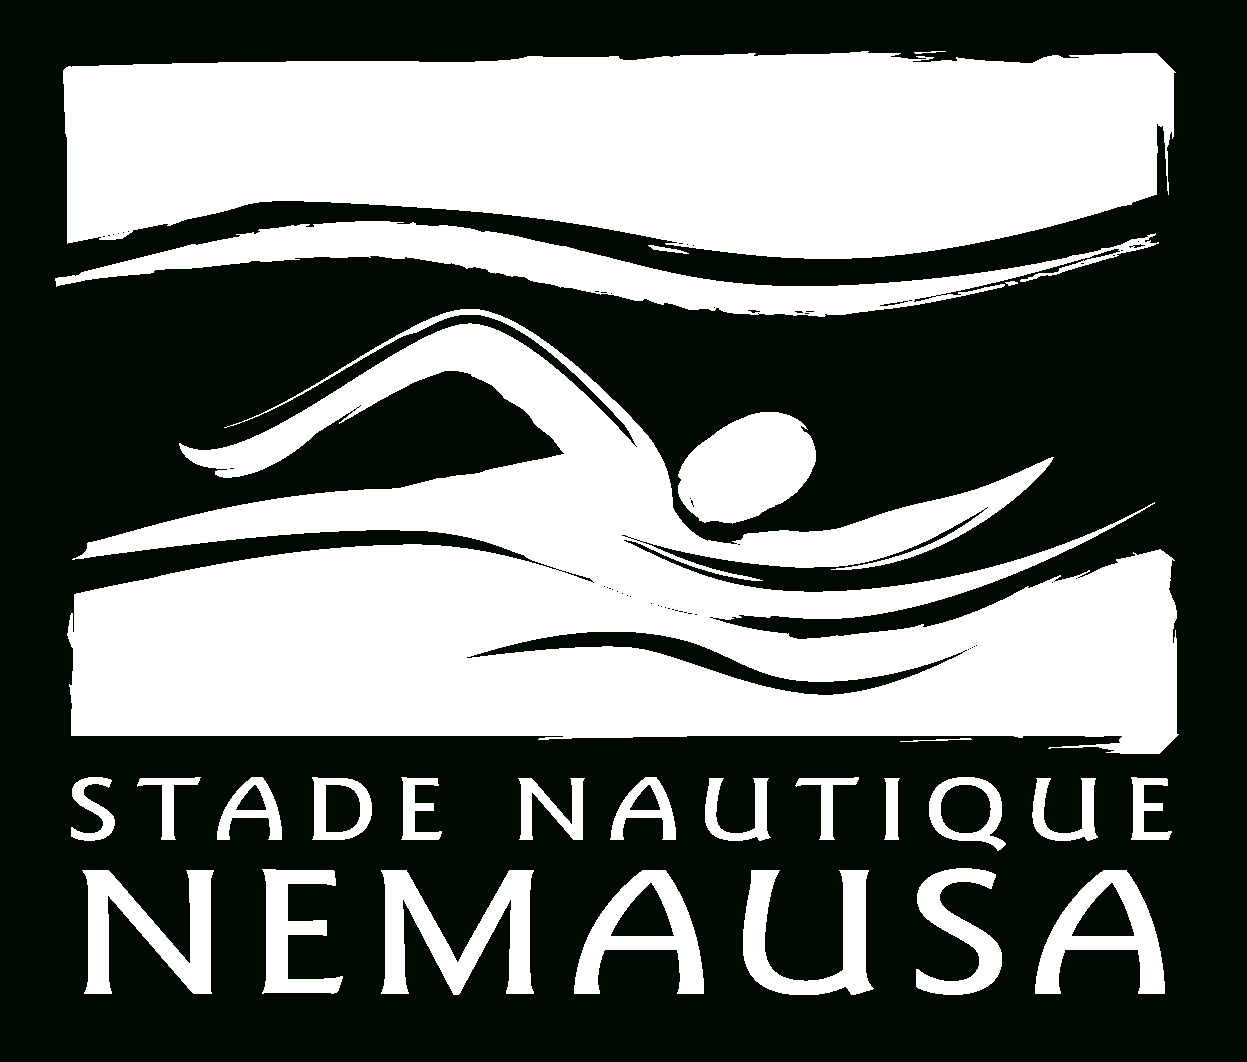 Némausa – Nîmes – Vert Marine – Le Grand Centre Aquatique De ... tout Piscine Nemausa